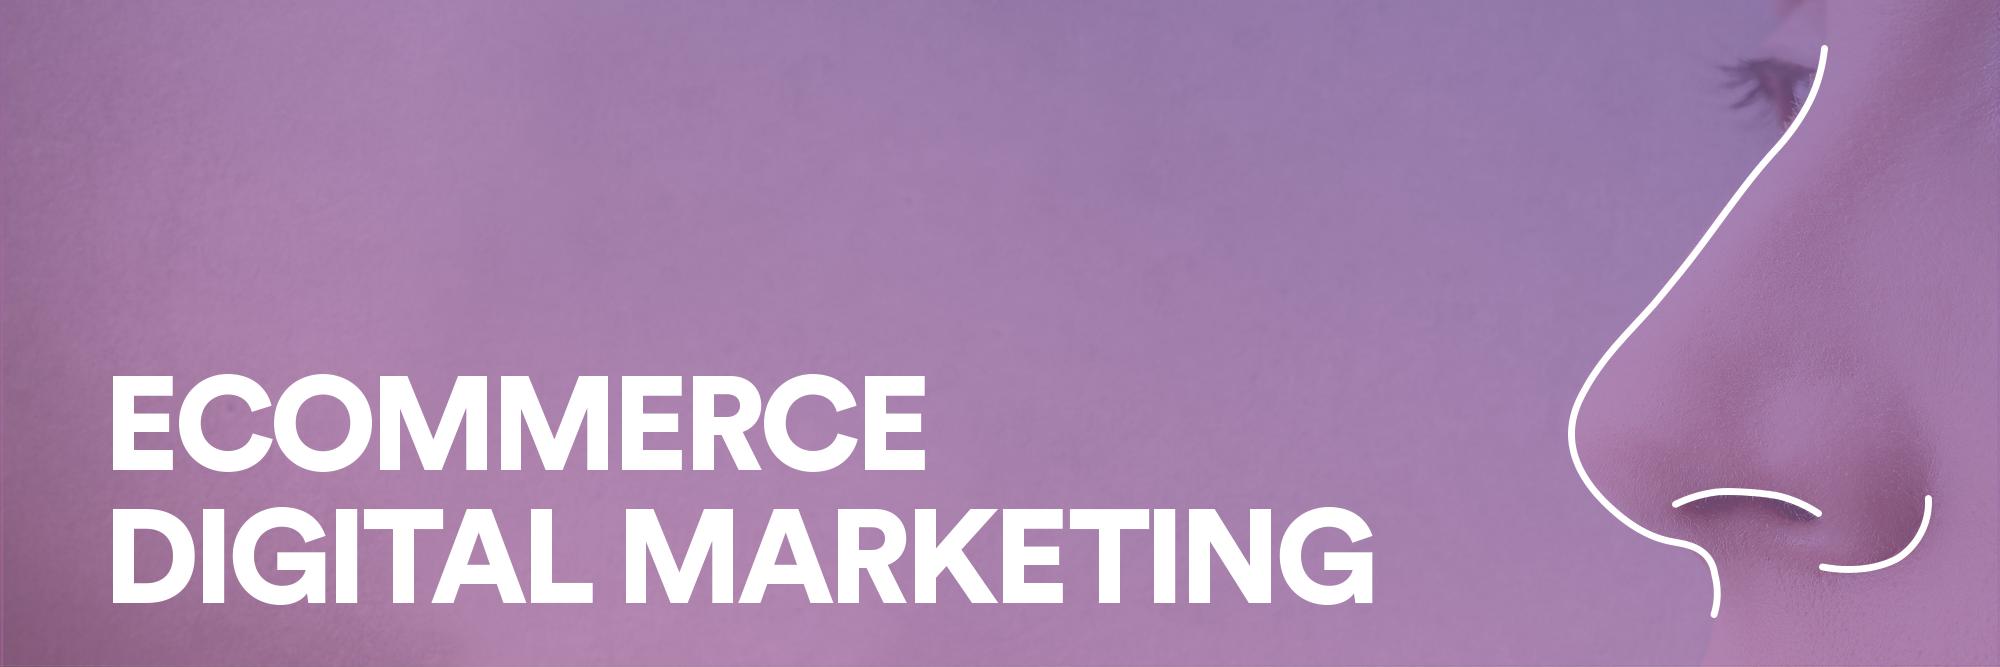 Evenements-univers-ecommerce-digital-marketing